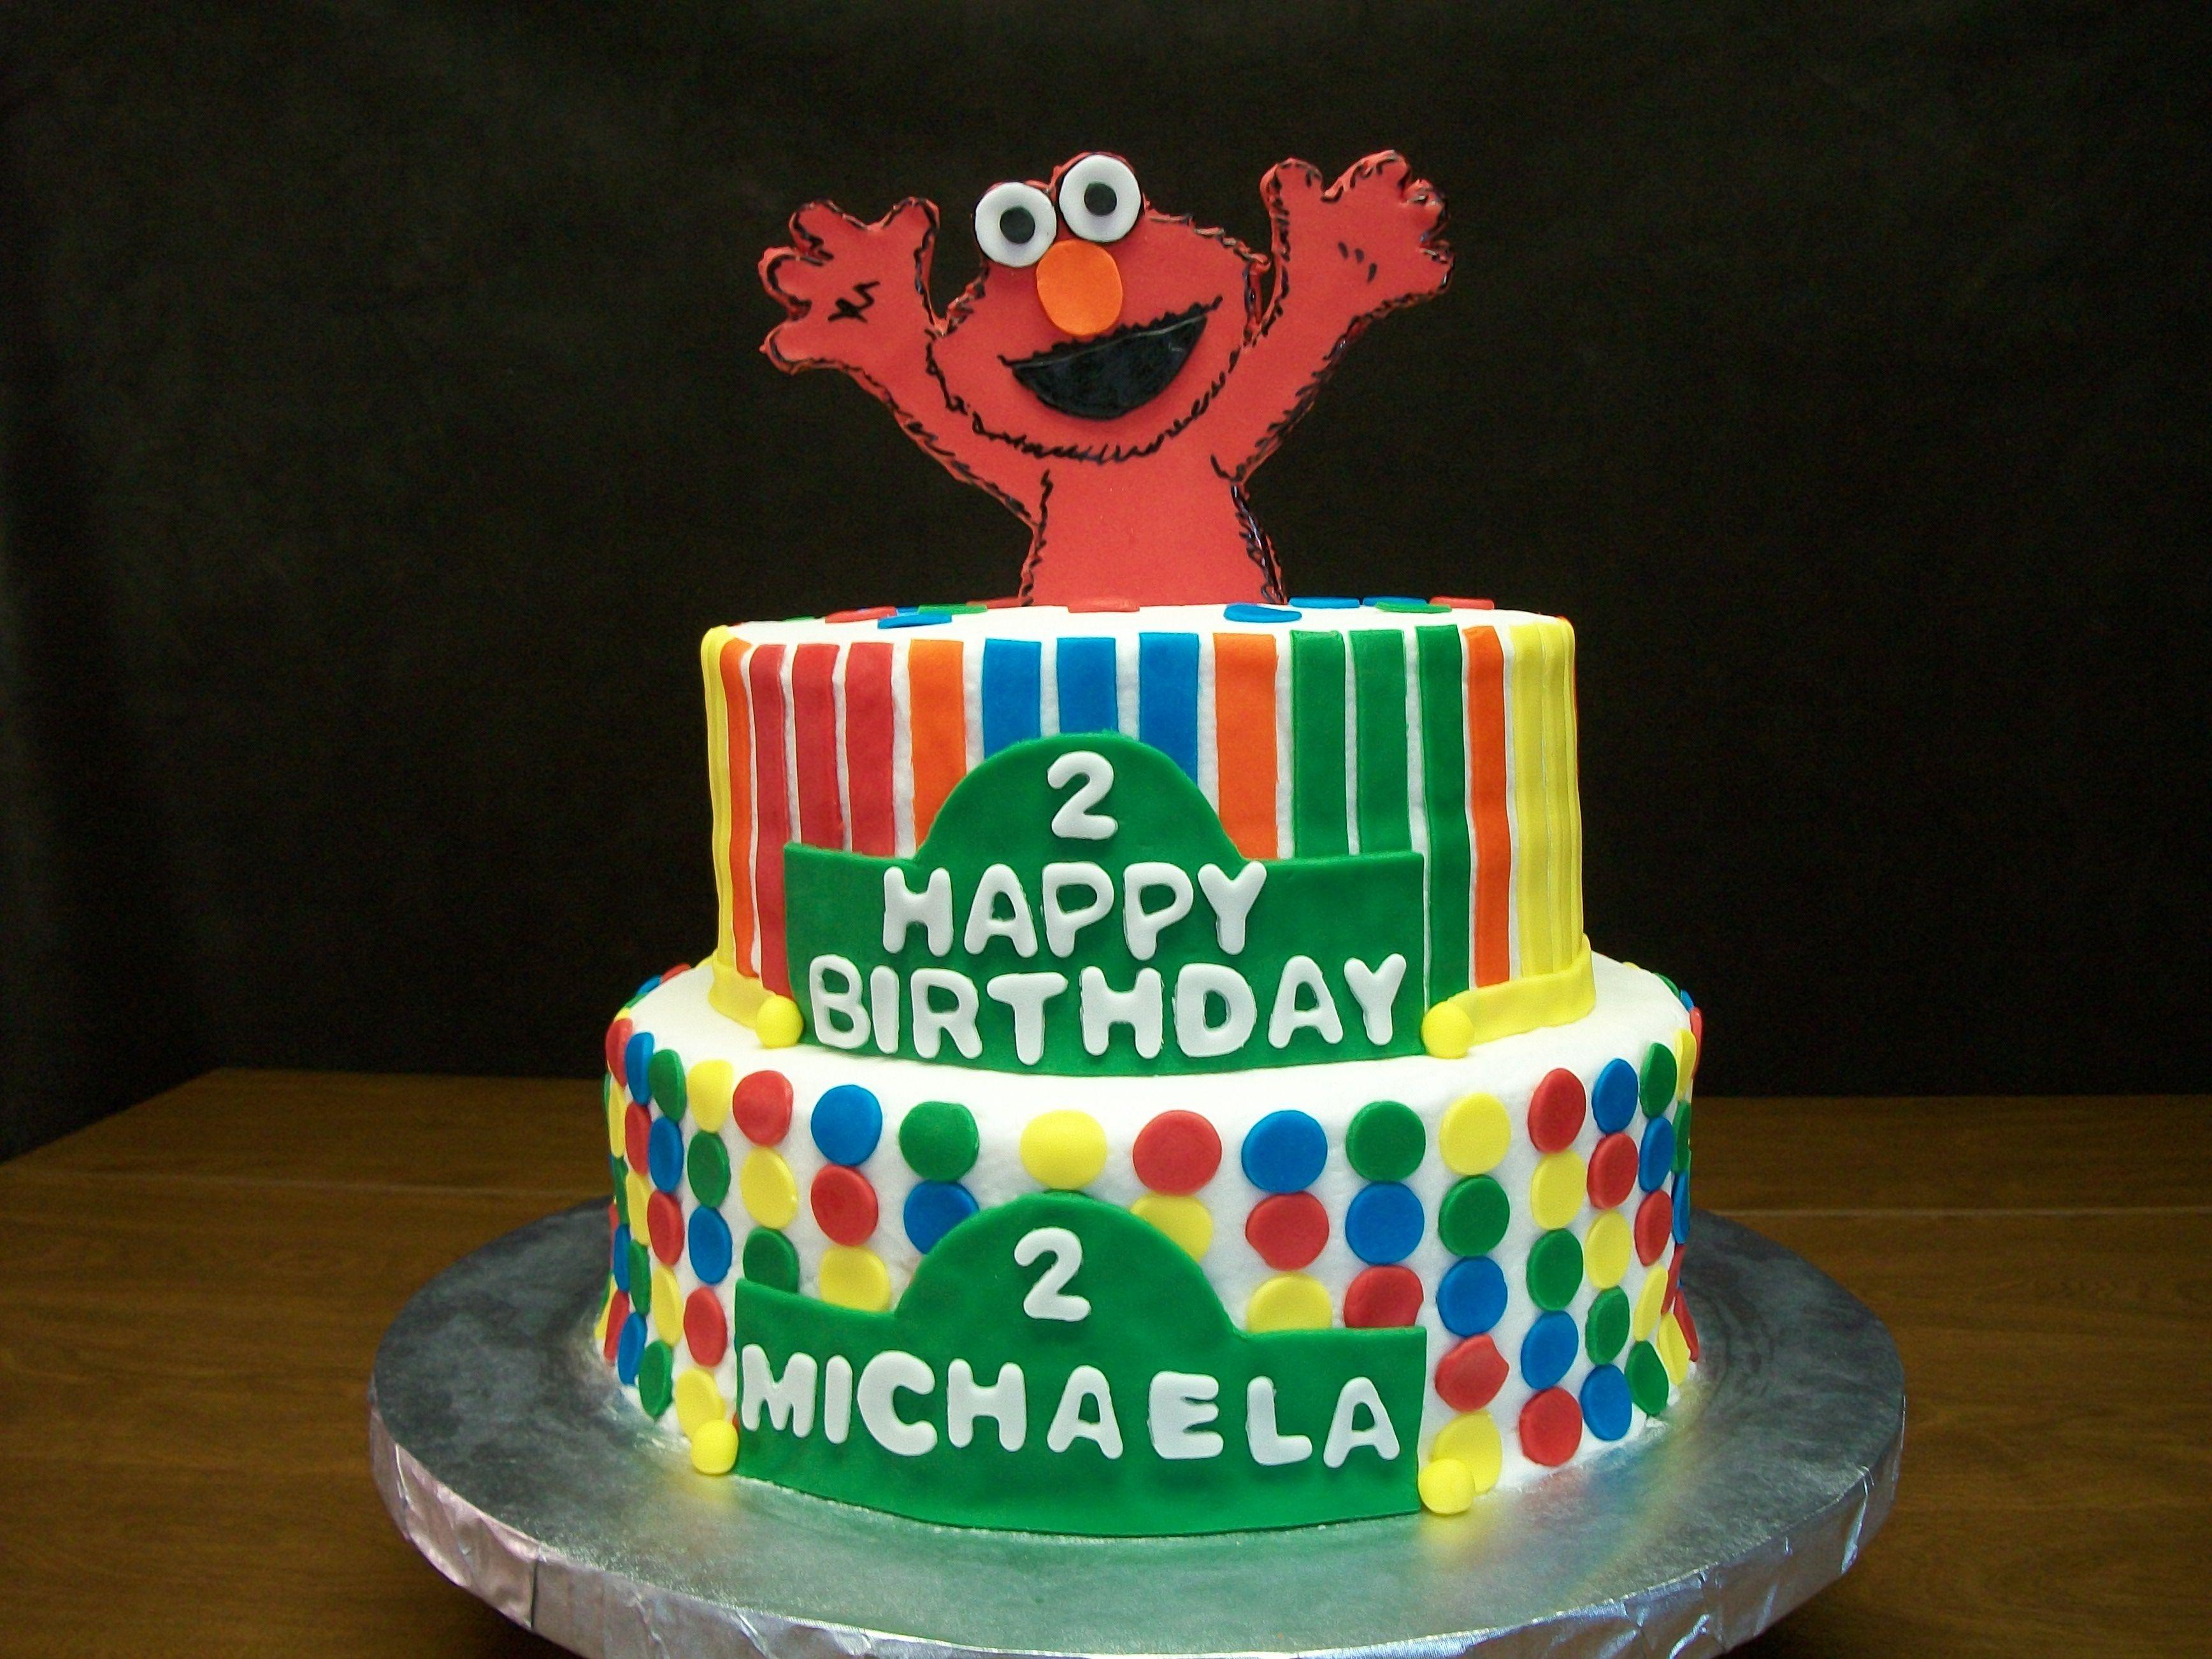 ... year old  Birthday cake ideas  Pinterest  Elmo Cake, 2 Year Olds